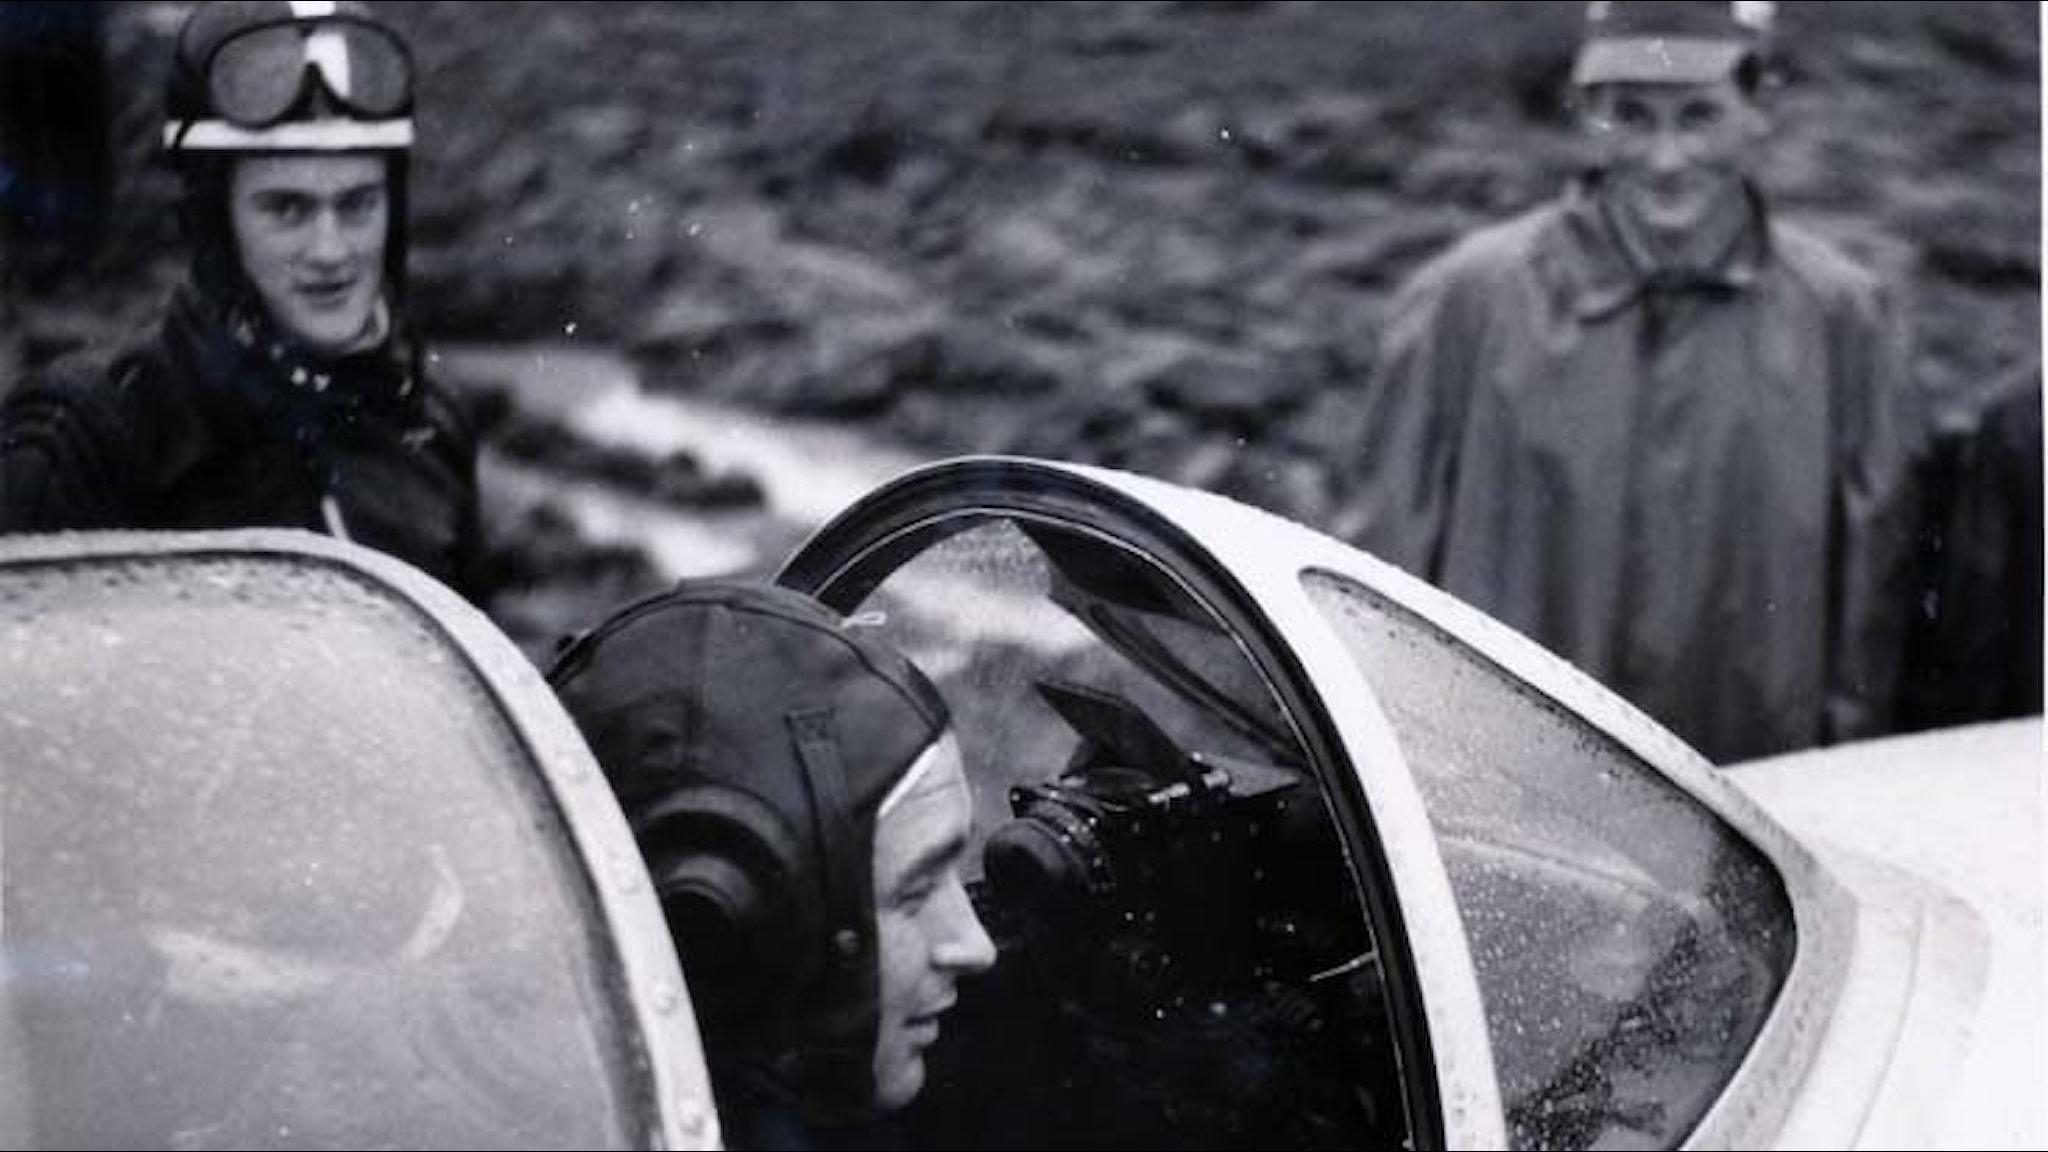 MiG-planet.